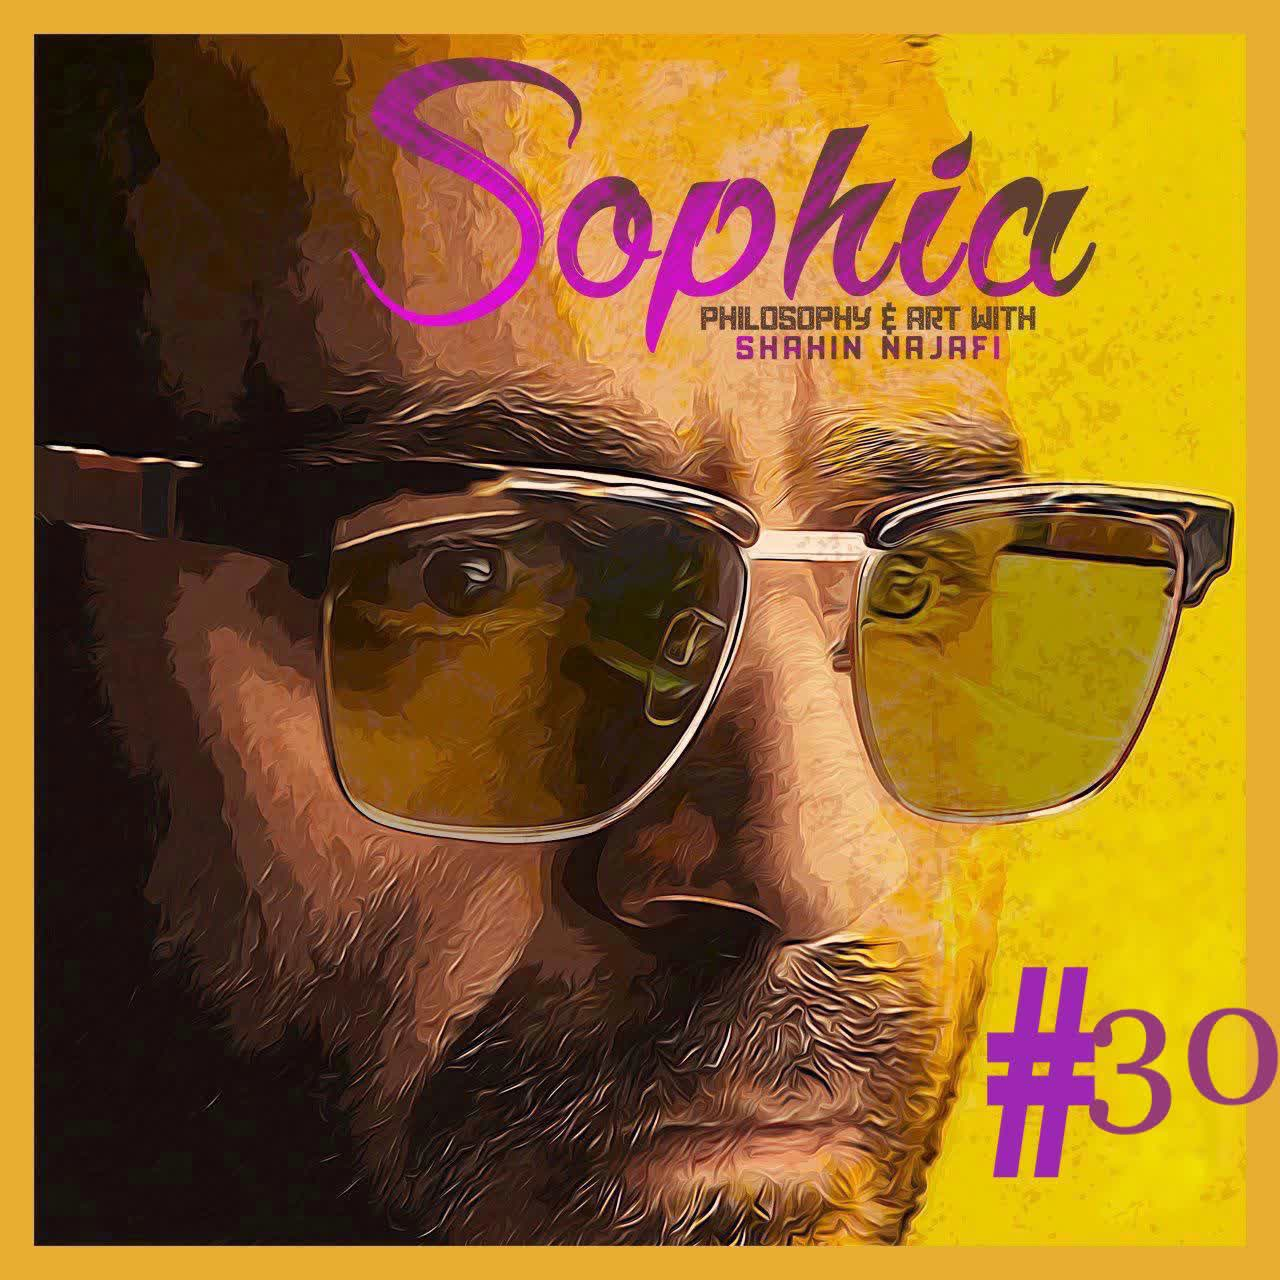 Sophia #30 Aristotle 5- Shahin Najafi & Veria Amiri سوفیا ۳۰ - ارسطو ۵ - شاهین نجفی و وریا امیری